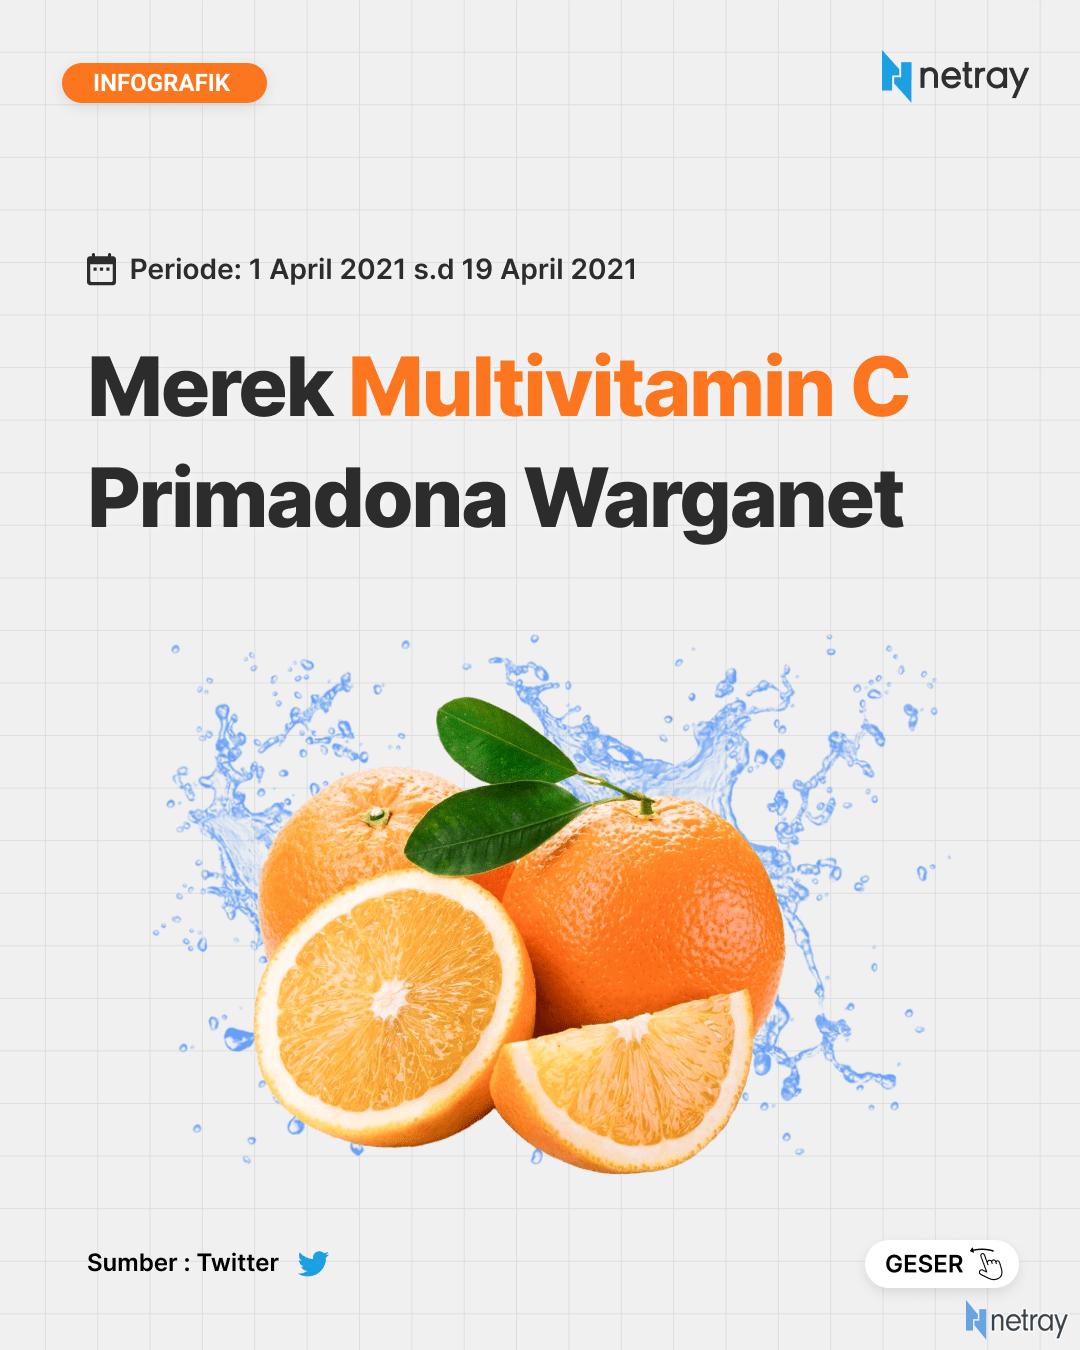 Merek Multivitamin C Primadona Warganet